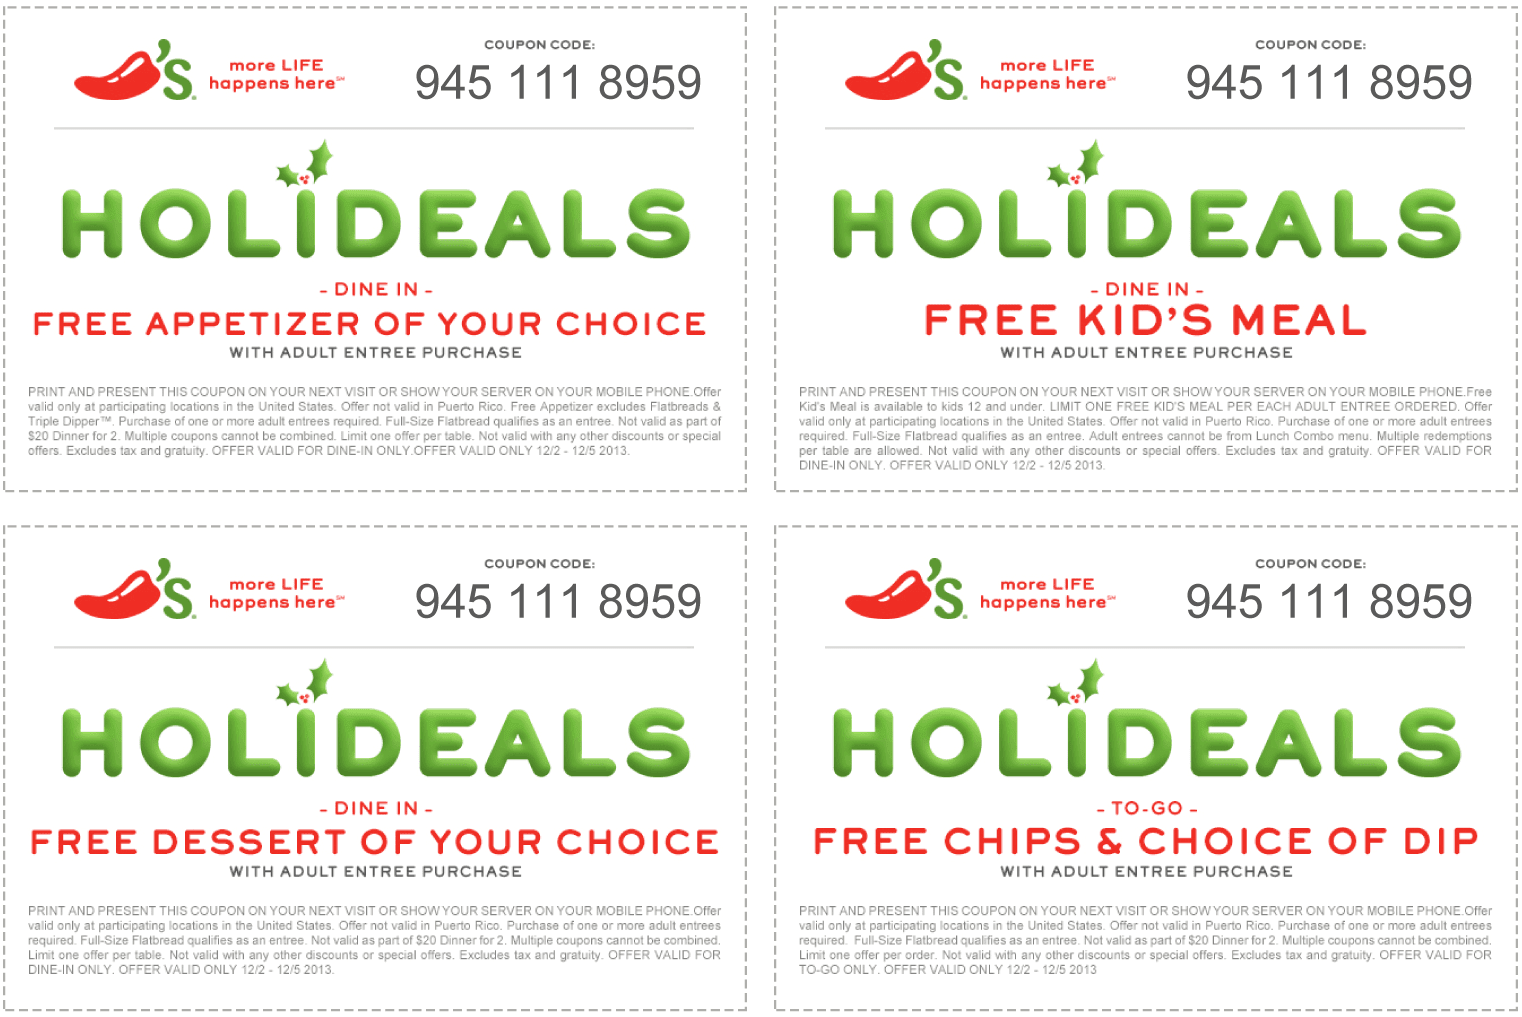 Chilis coupon code